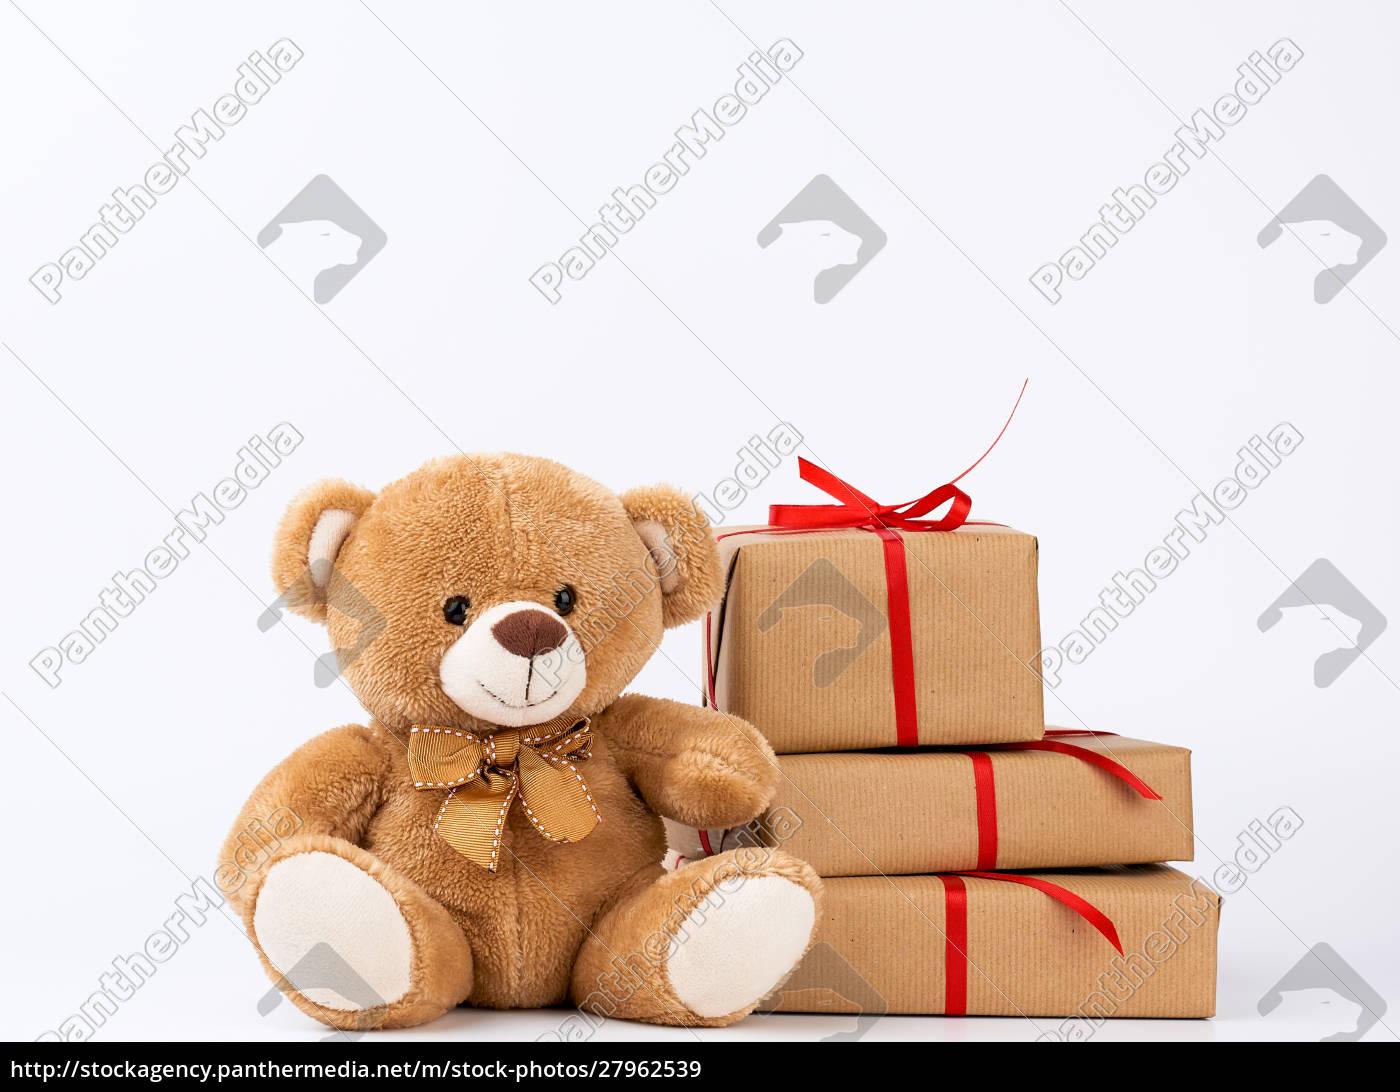 cute, beige, teddy, bear, and, stack - 27962539